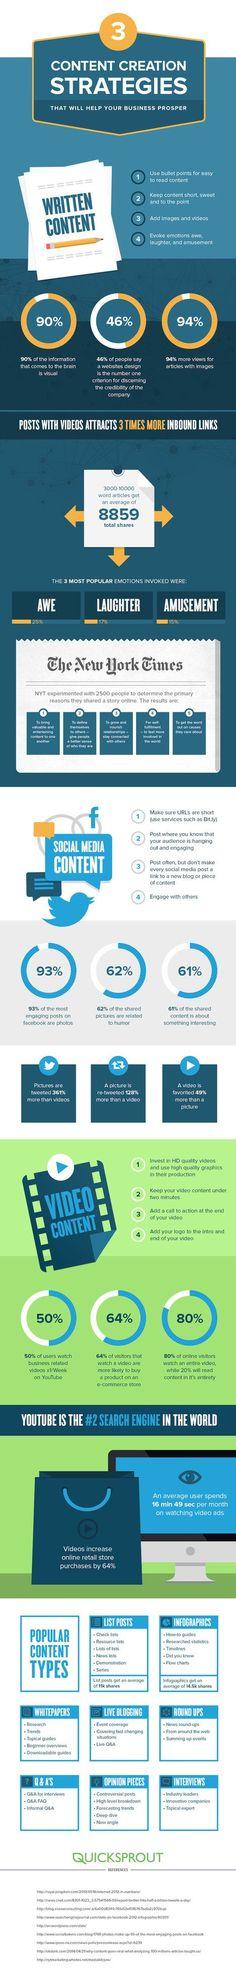 3 Content Creation Strategies That Will Help You Prosper   Public Relations & Social Media Insight #publicrelationstips